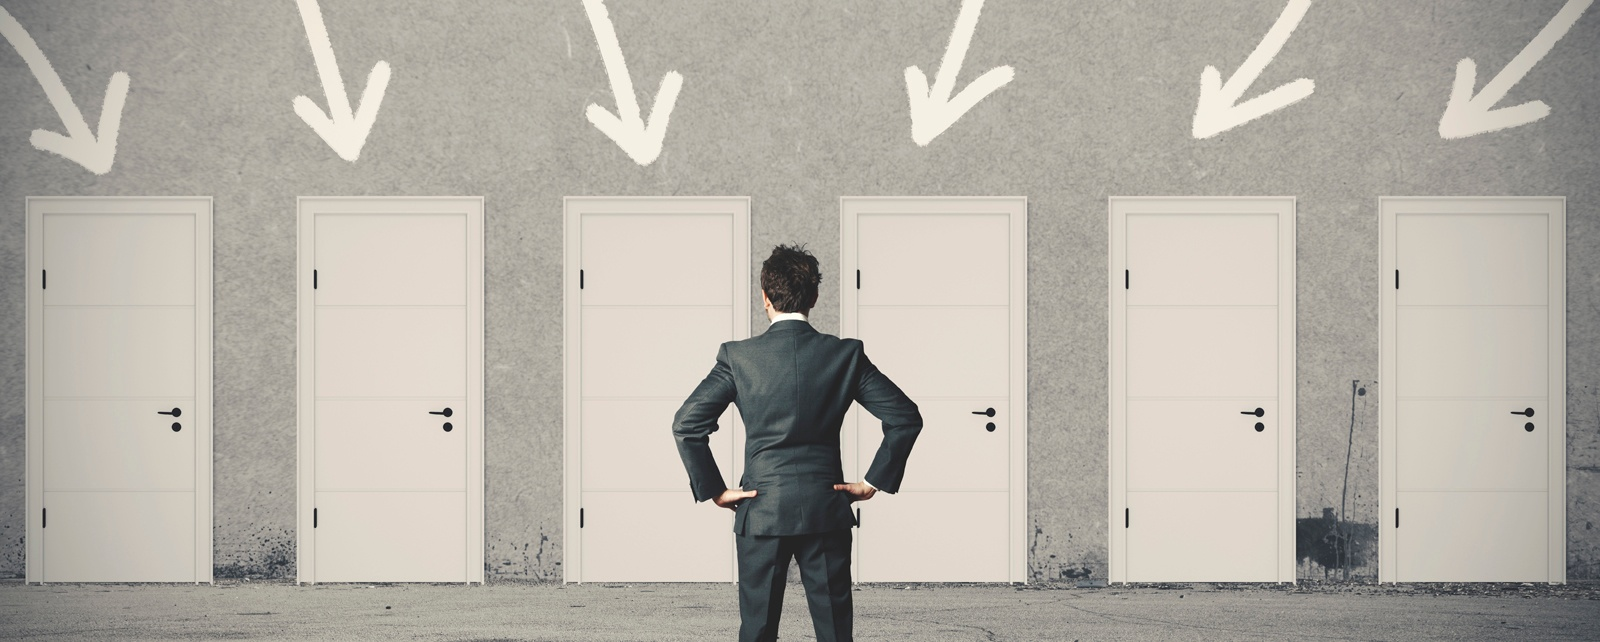 man_back_doors.jpg